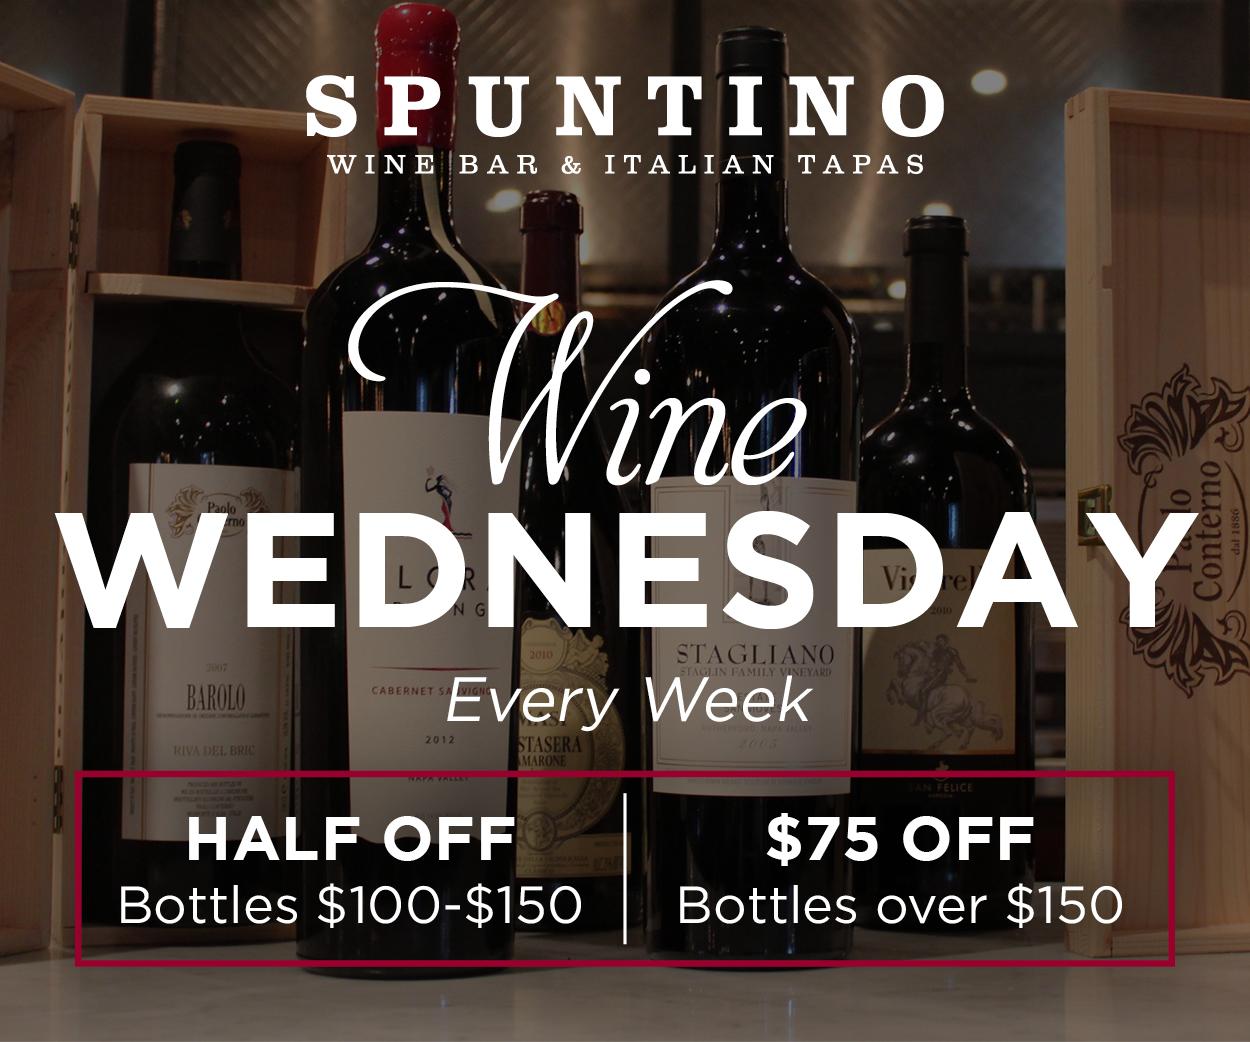 Spuntino_Wine Wednesday Spuntino.jpg